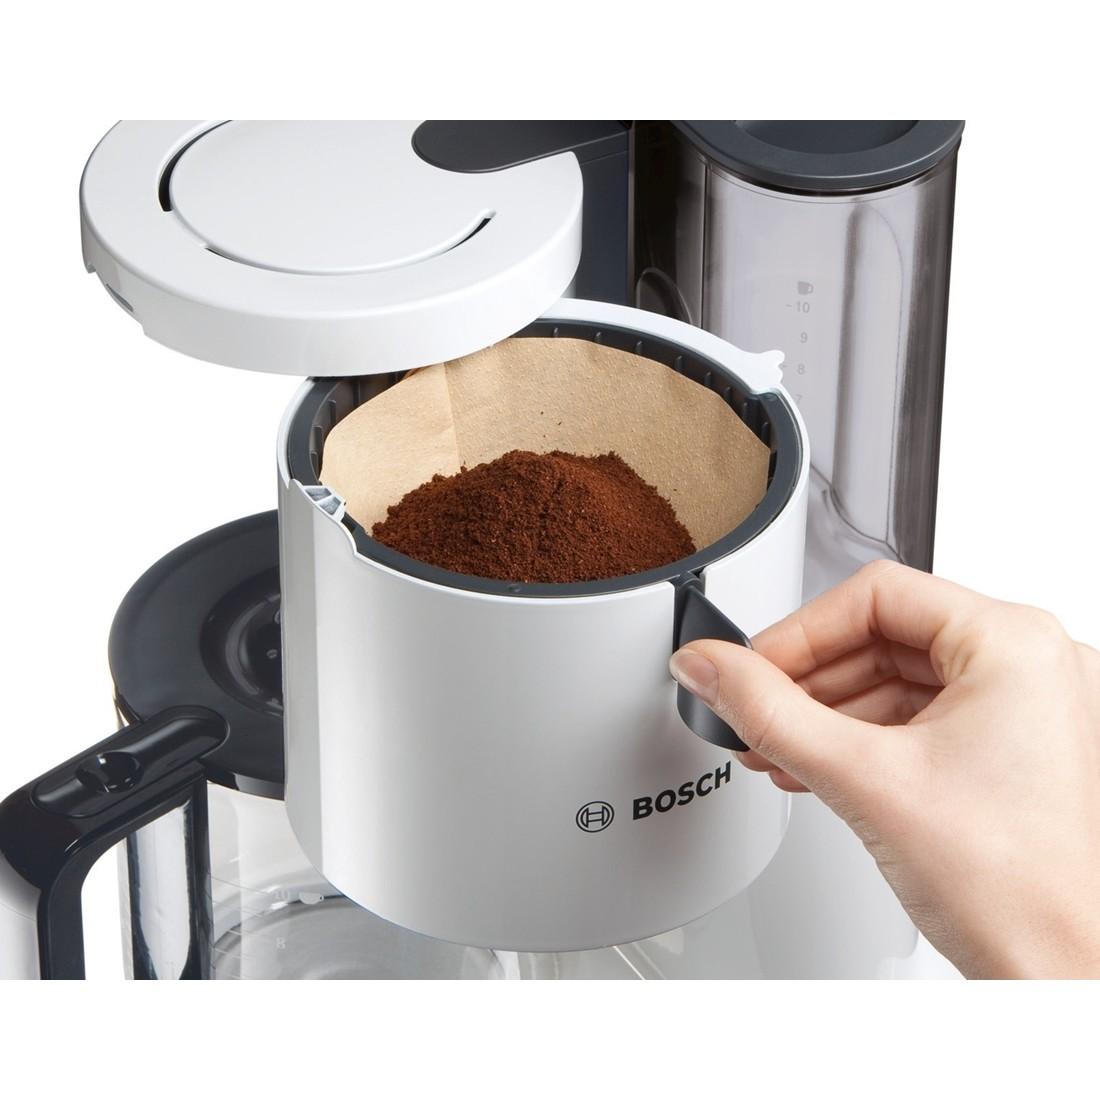 kaffeemaschine abnehmbarer wassertank inspirierendes design f r wohnm bel. Black Bedroom Furniture Sets. Home Design Ideas